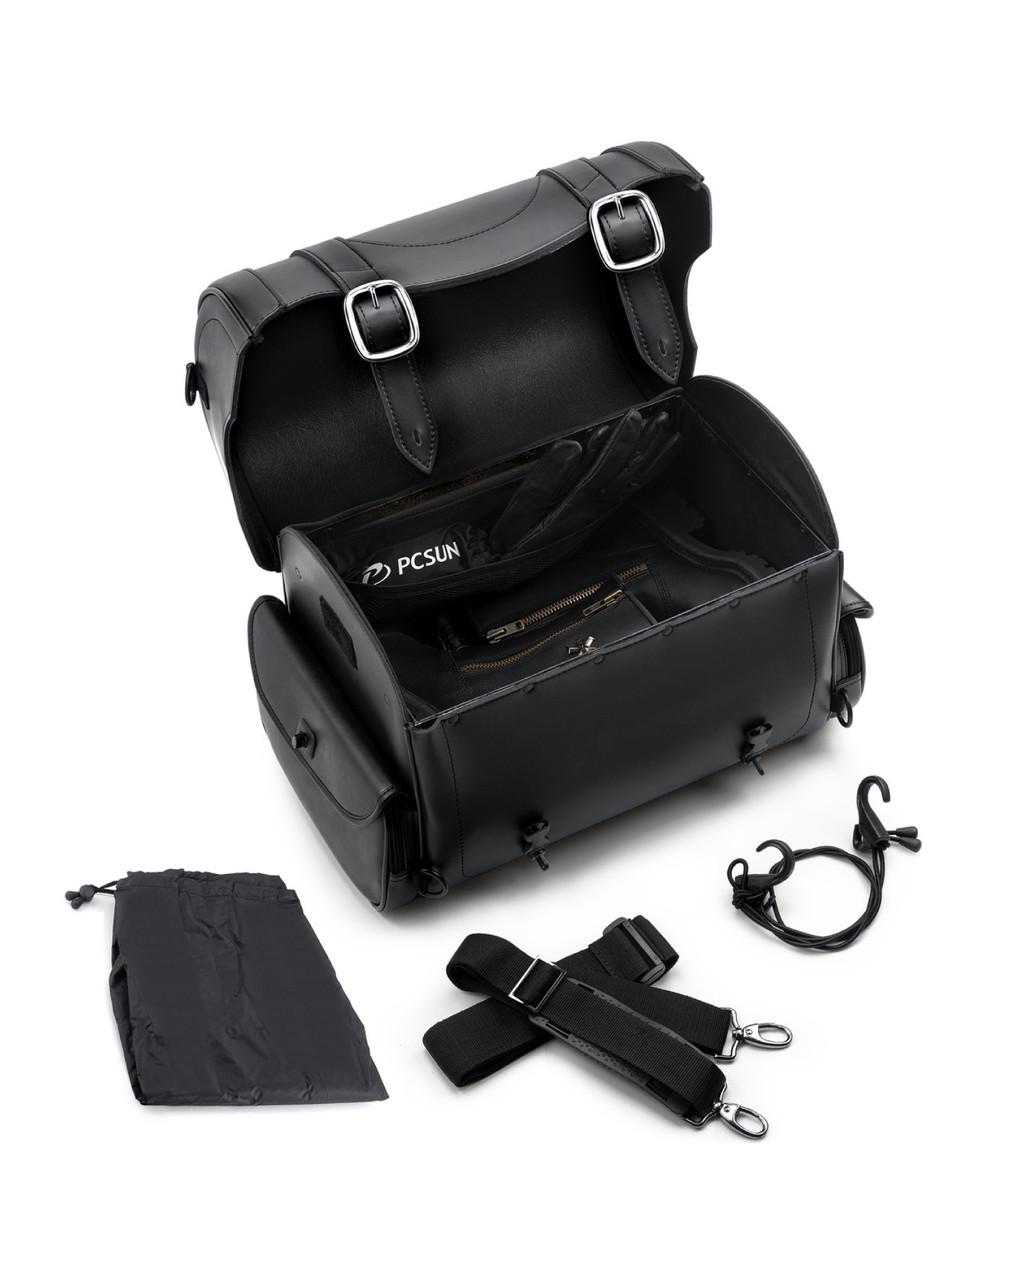 Harley Davidson Viking Century Studded Motorcycle Sissy Bar Bag Strap Set